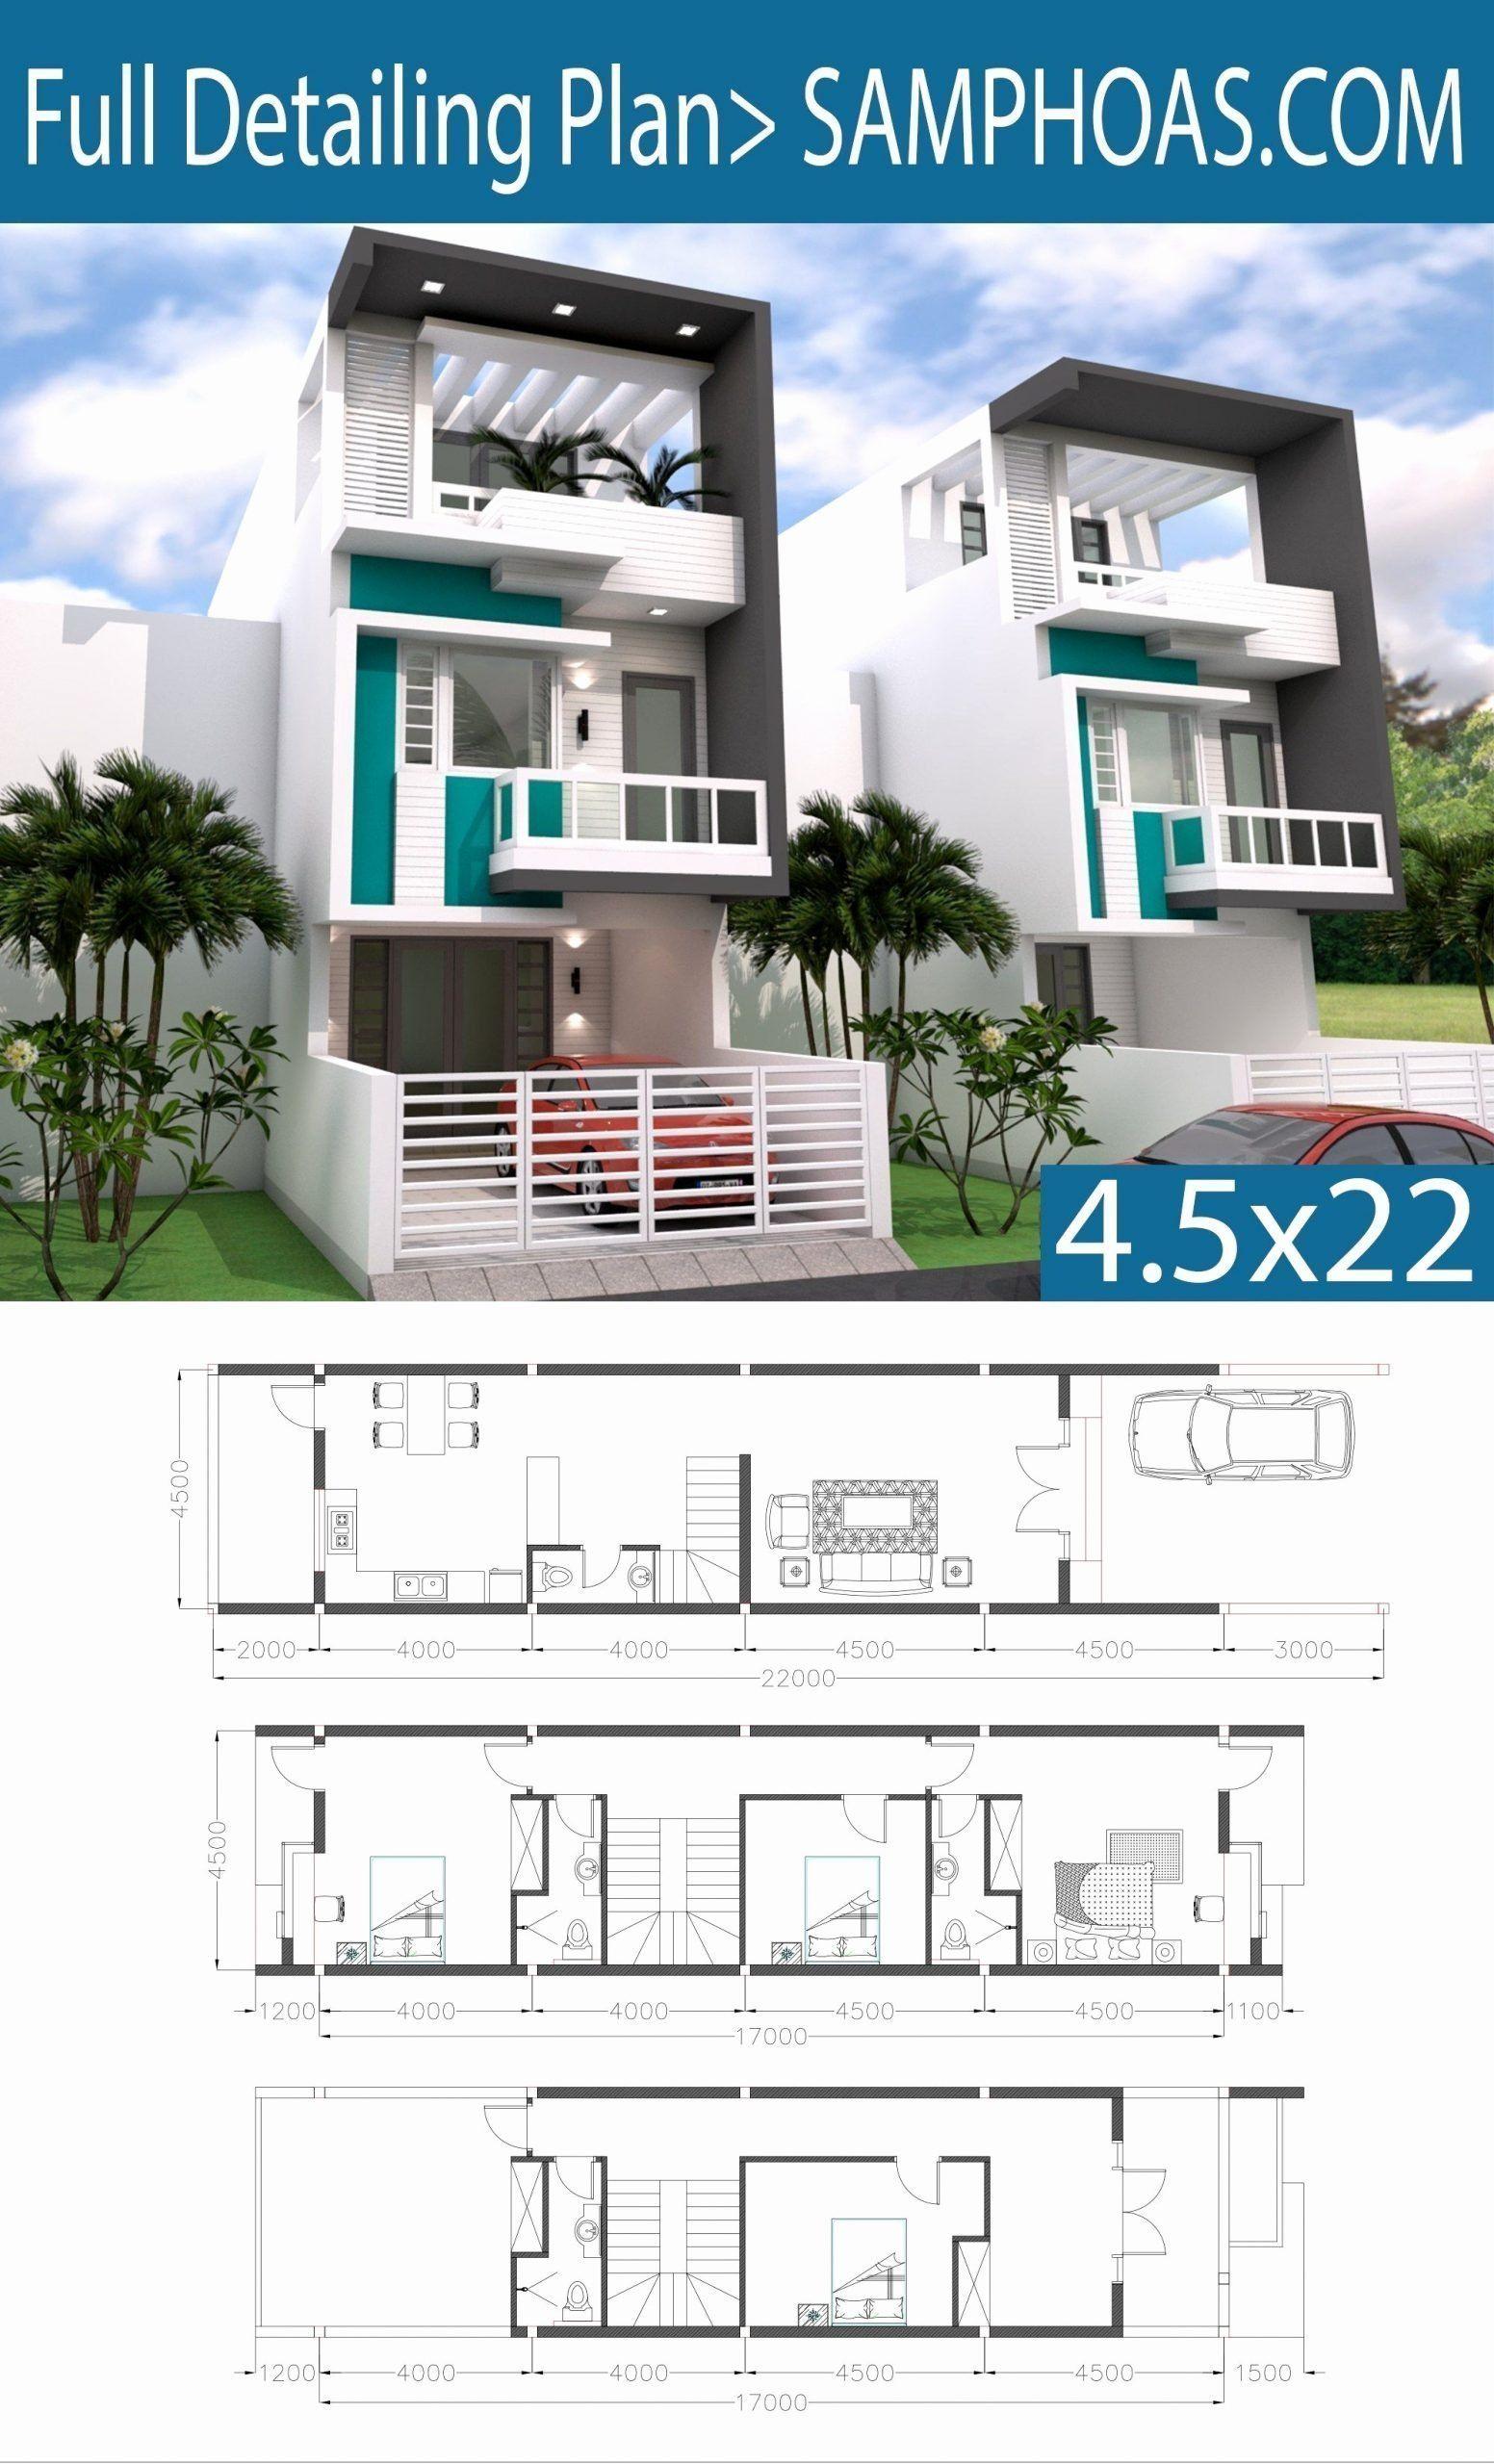 Narrow Home Design Plans Beautiful Sketchup 3 Story Narrow Home Plan 4 5x20m Samphoas Plan Narrow House Plans Architectural House Plans Model House Plan